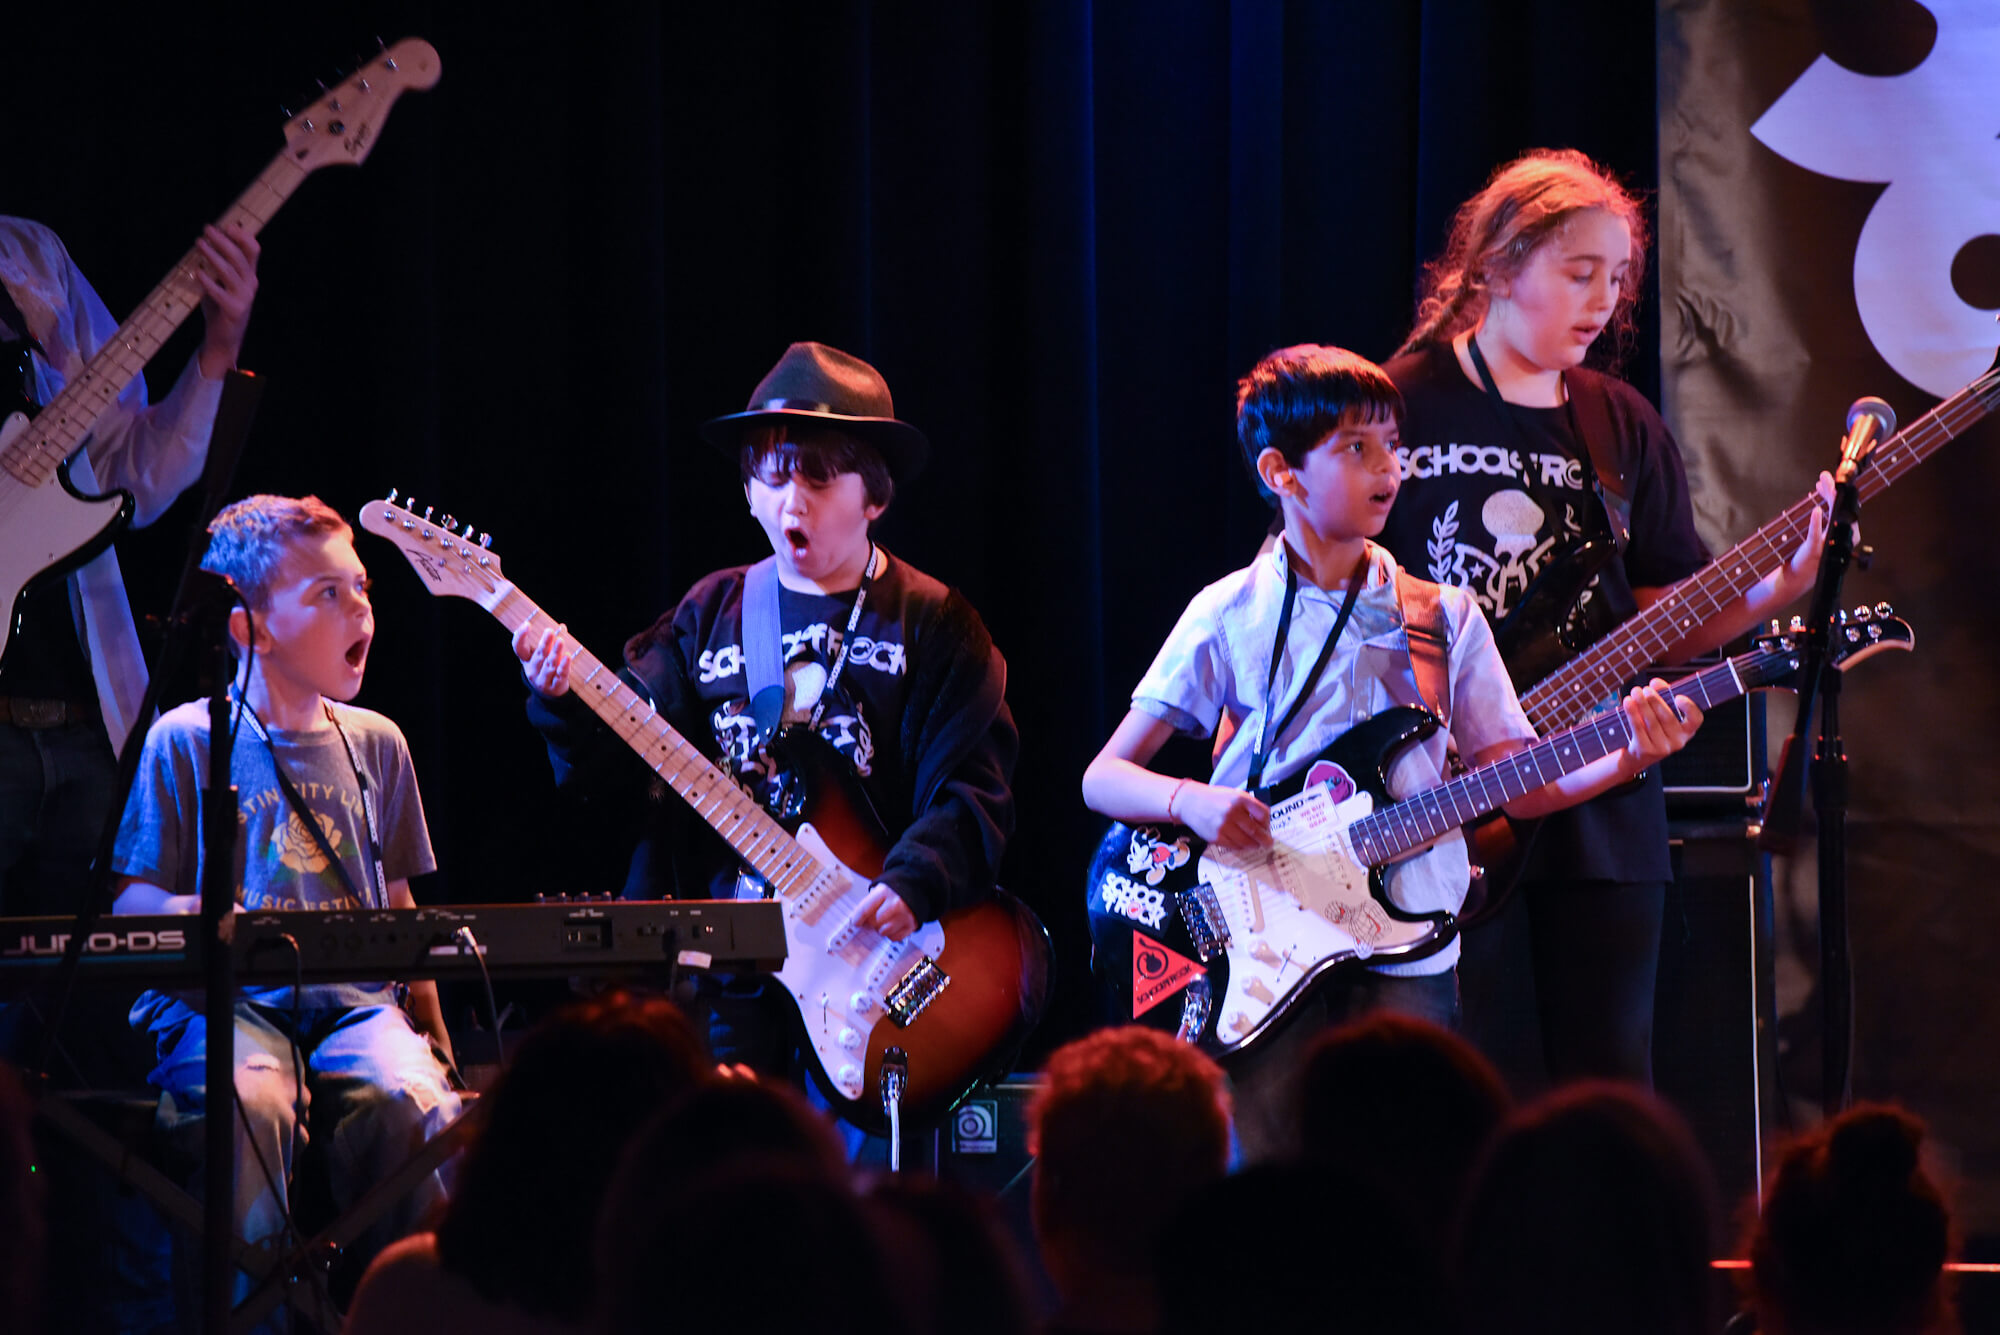 Luke, Ryne, Parth and Larken performing